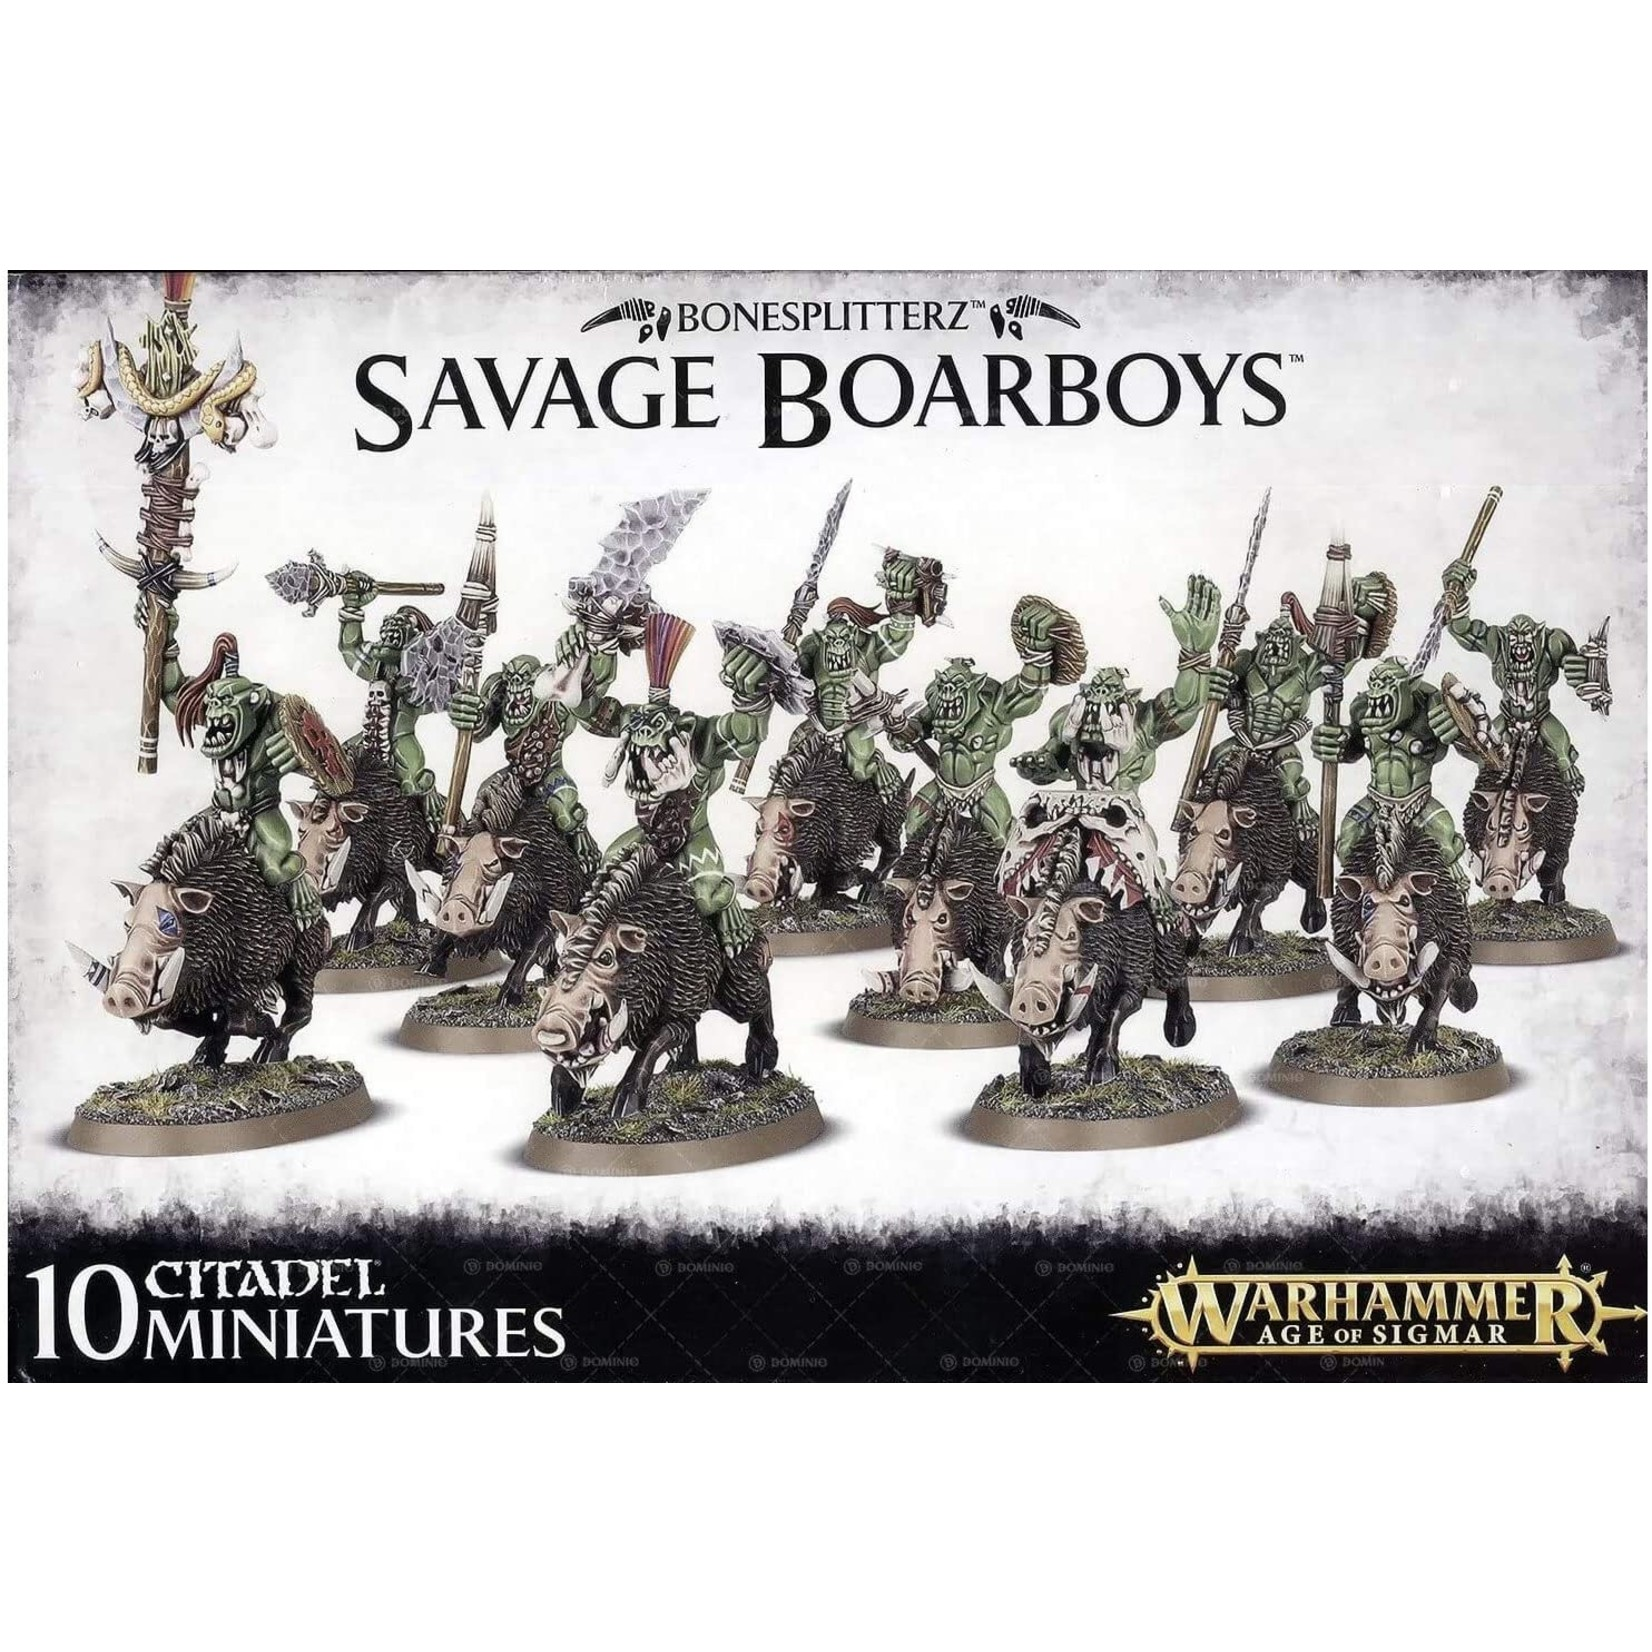 Games Workshop Warhammer Age of Sigmar: Bonesplitterz Savage Boarboys